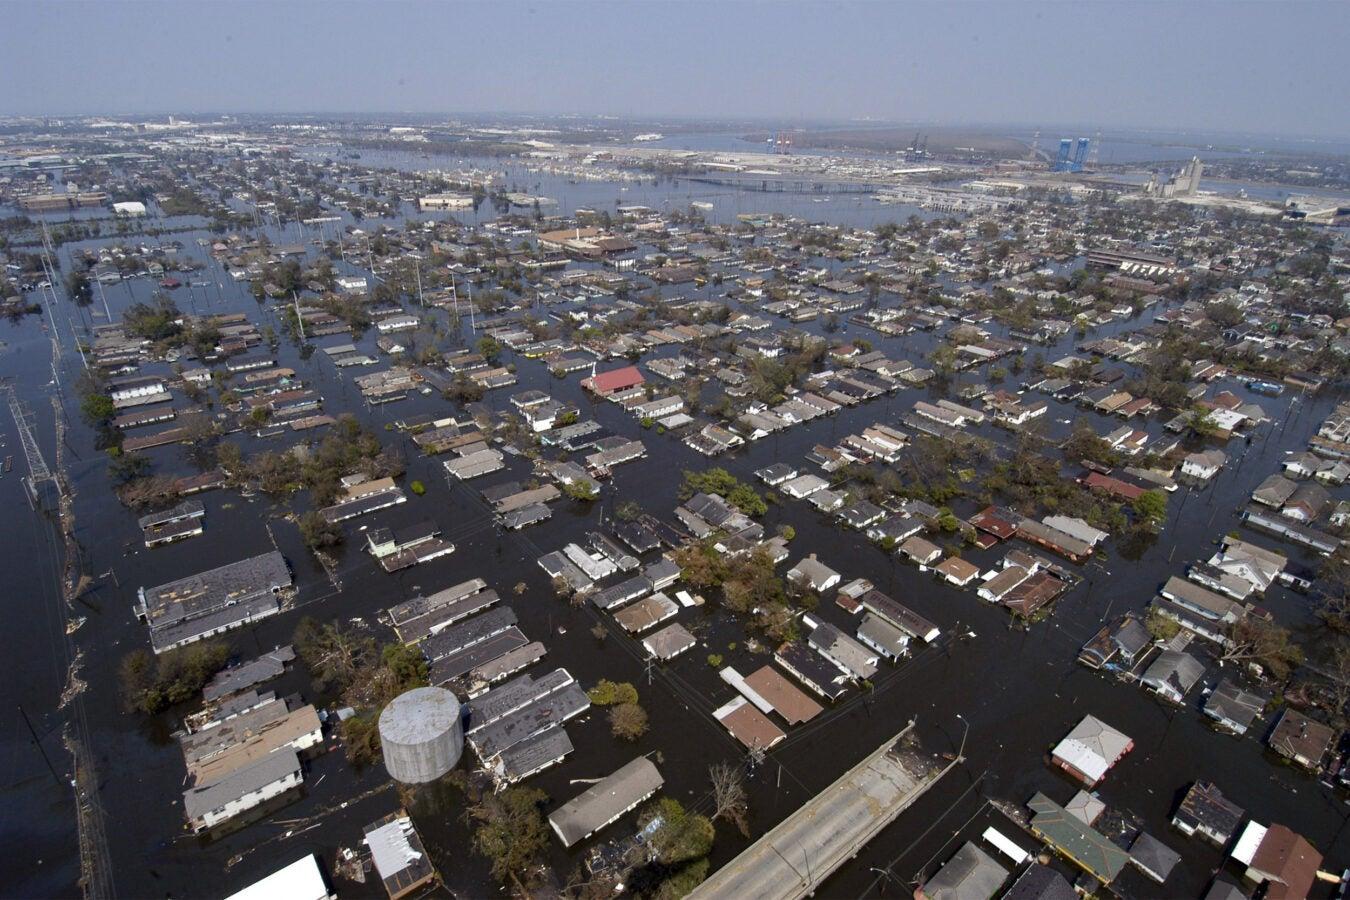 New Orleans following Hurricane Katrina